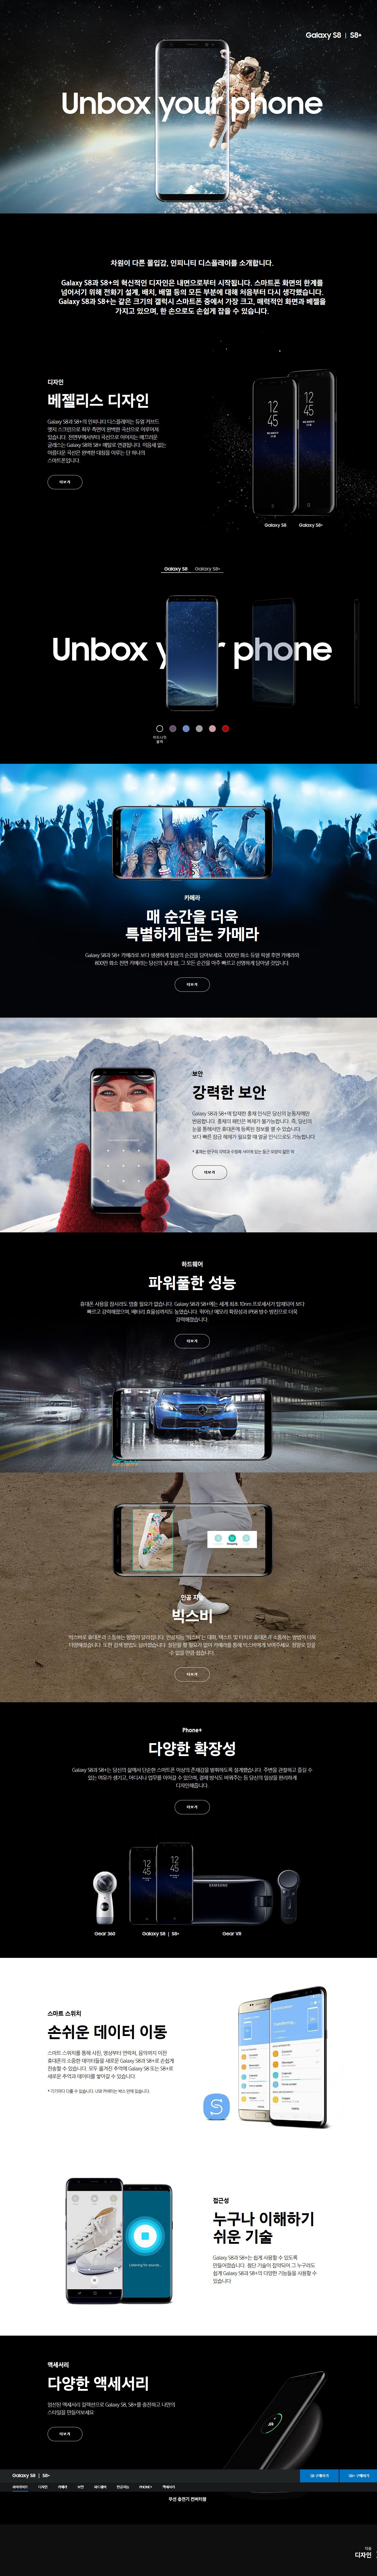 Screenshot_2018-12-30 Samsung Galaxy S8 S8+.jpg